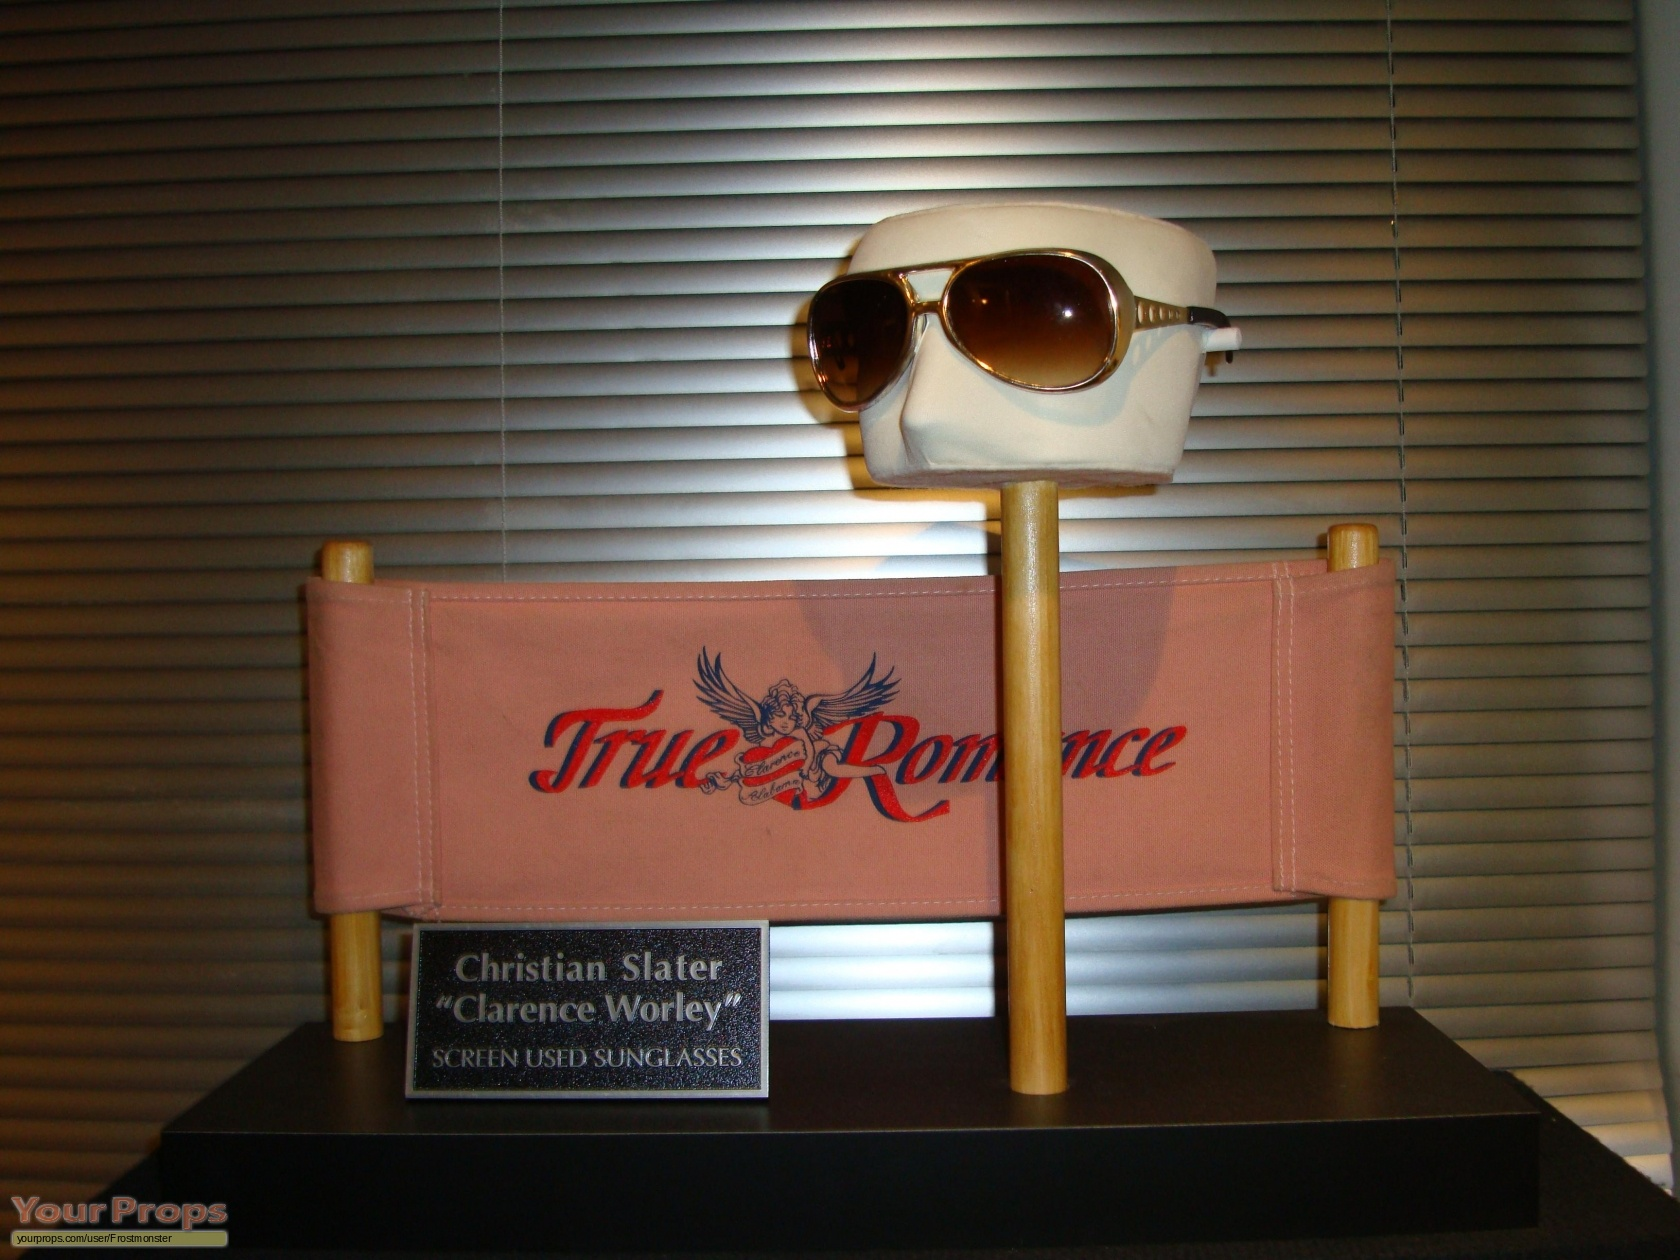 f8976e4fcd03 True romance clarence worley hero sunglasses original movie prop jpg  1680x1260 Sun glasses true romance